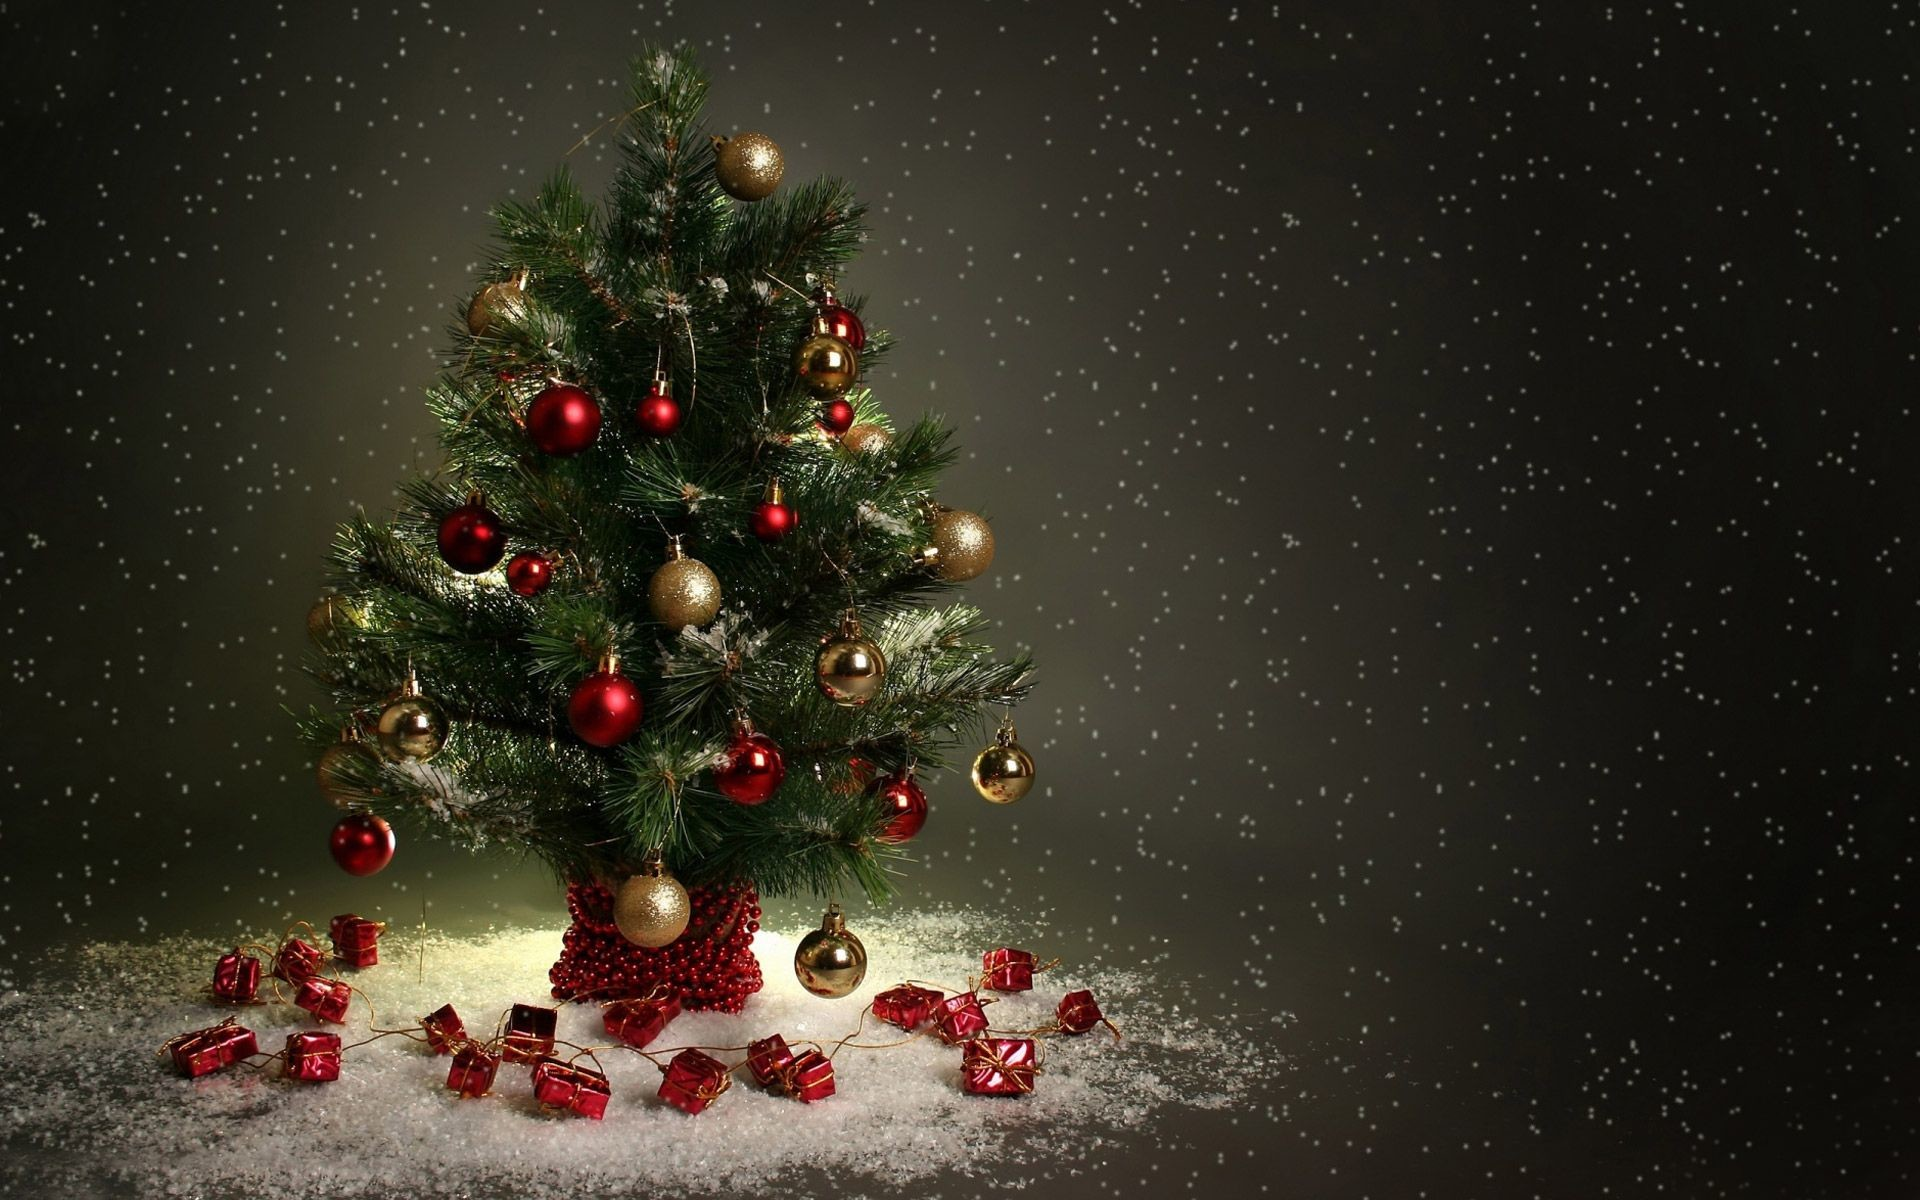 Beautiful Christmas Tree Hd Wallpapers, Free Download - Merry Christmas Tree Hd - HD Wallpaper